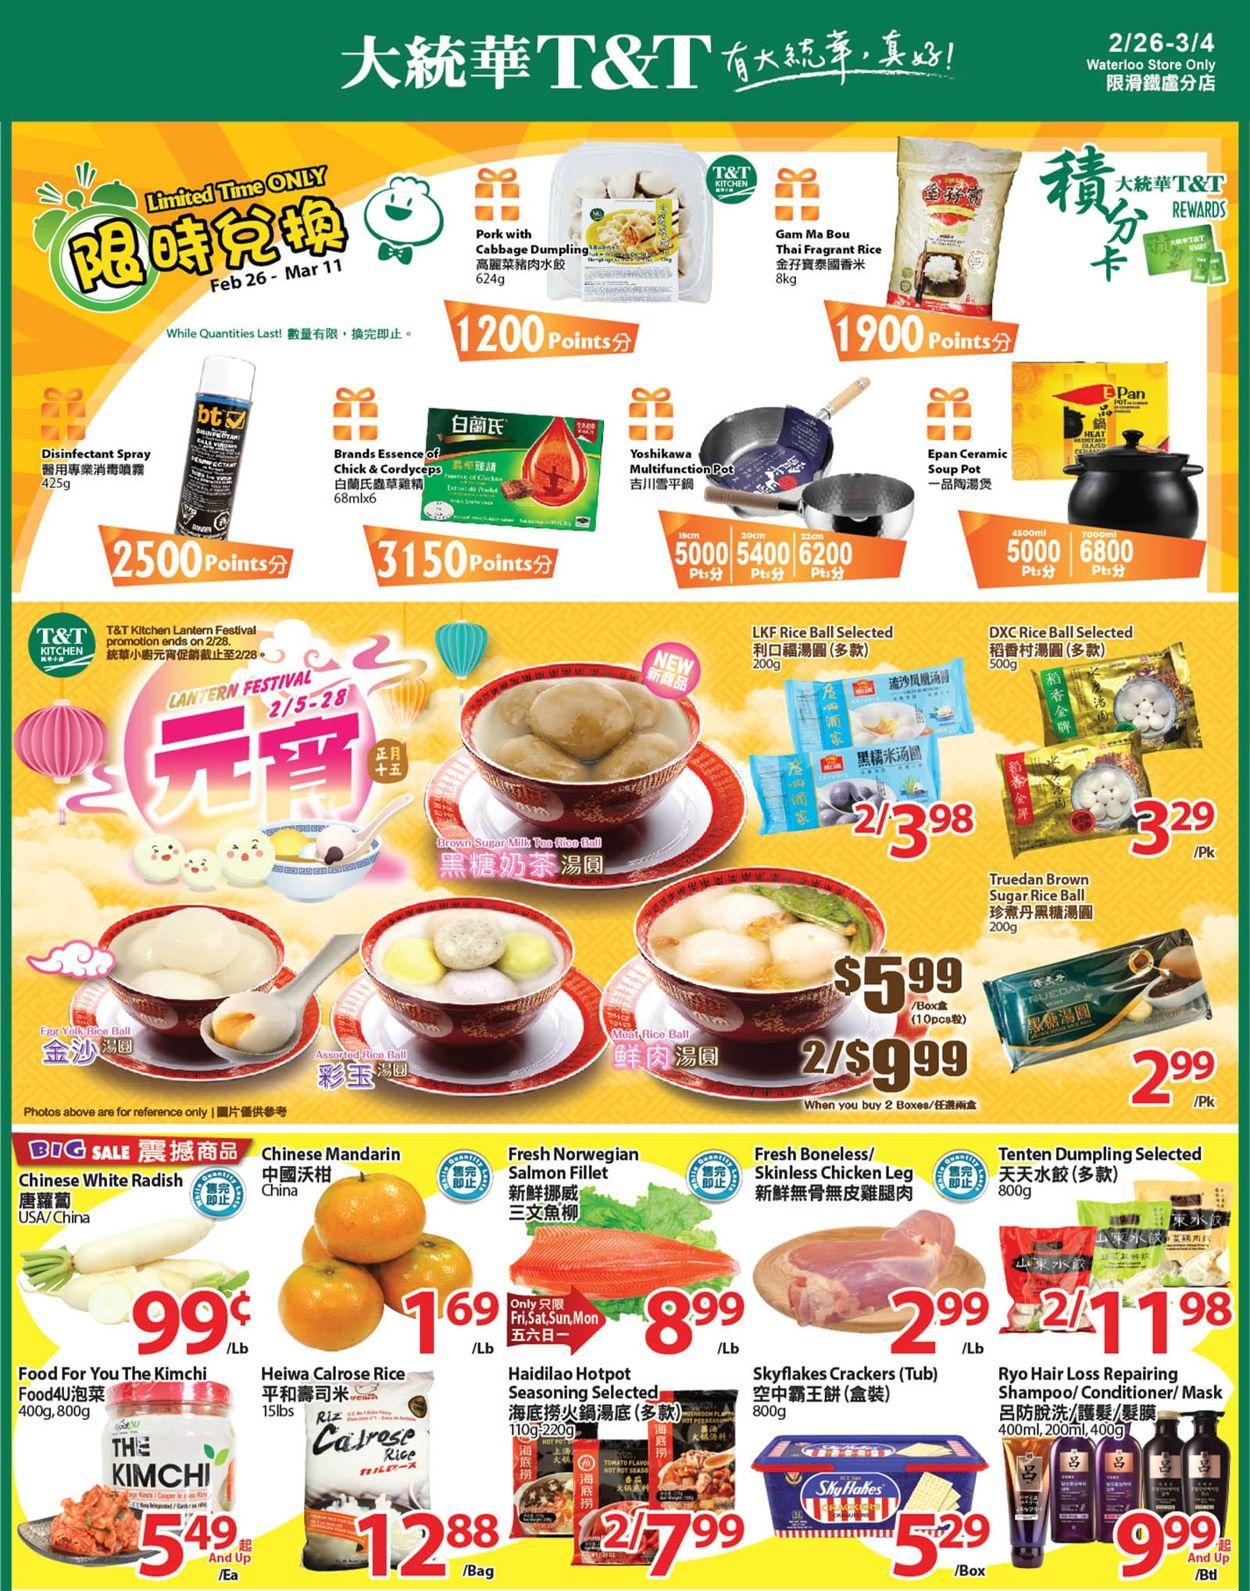 T&T Supermarket - Waterloo Flyer - 02/26-03/04/2021